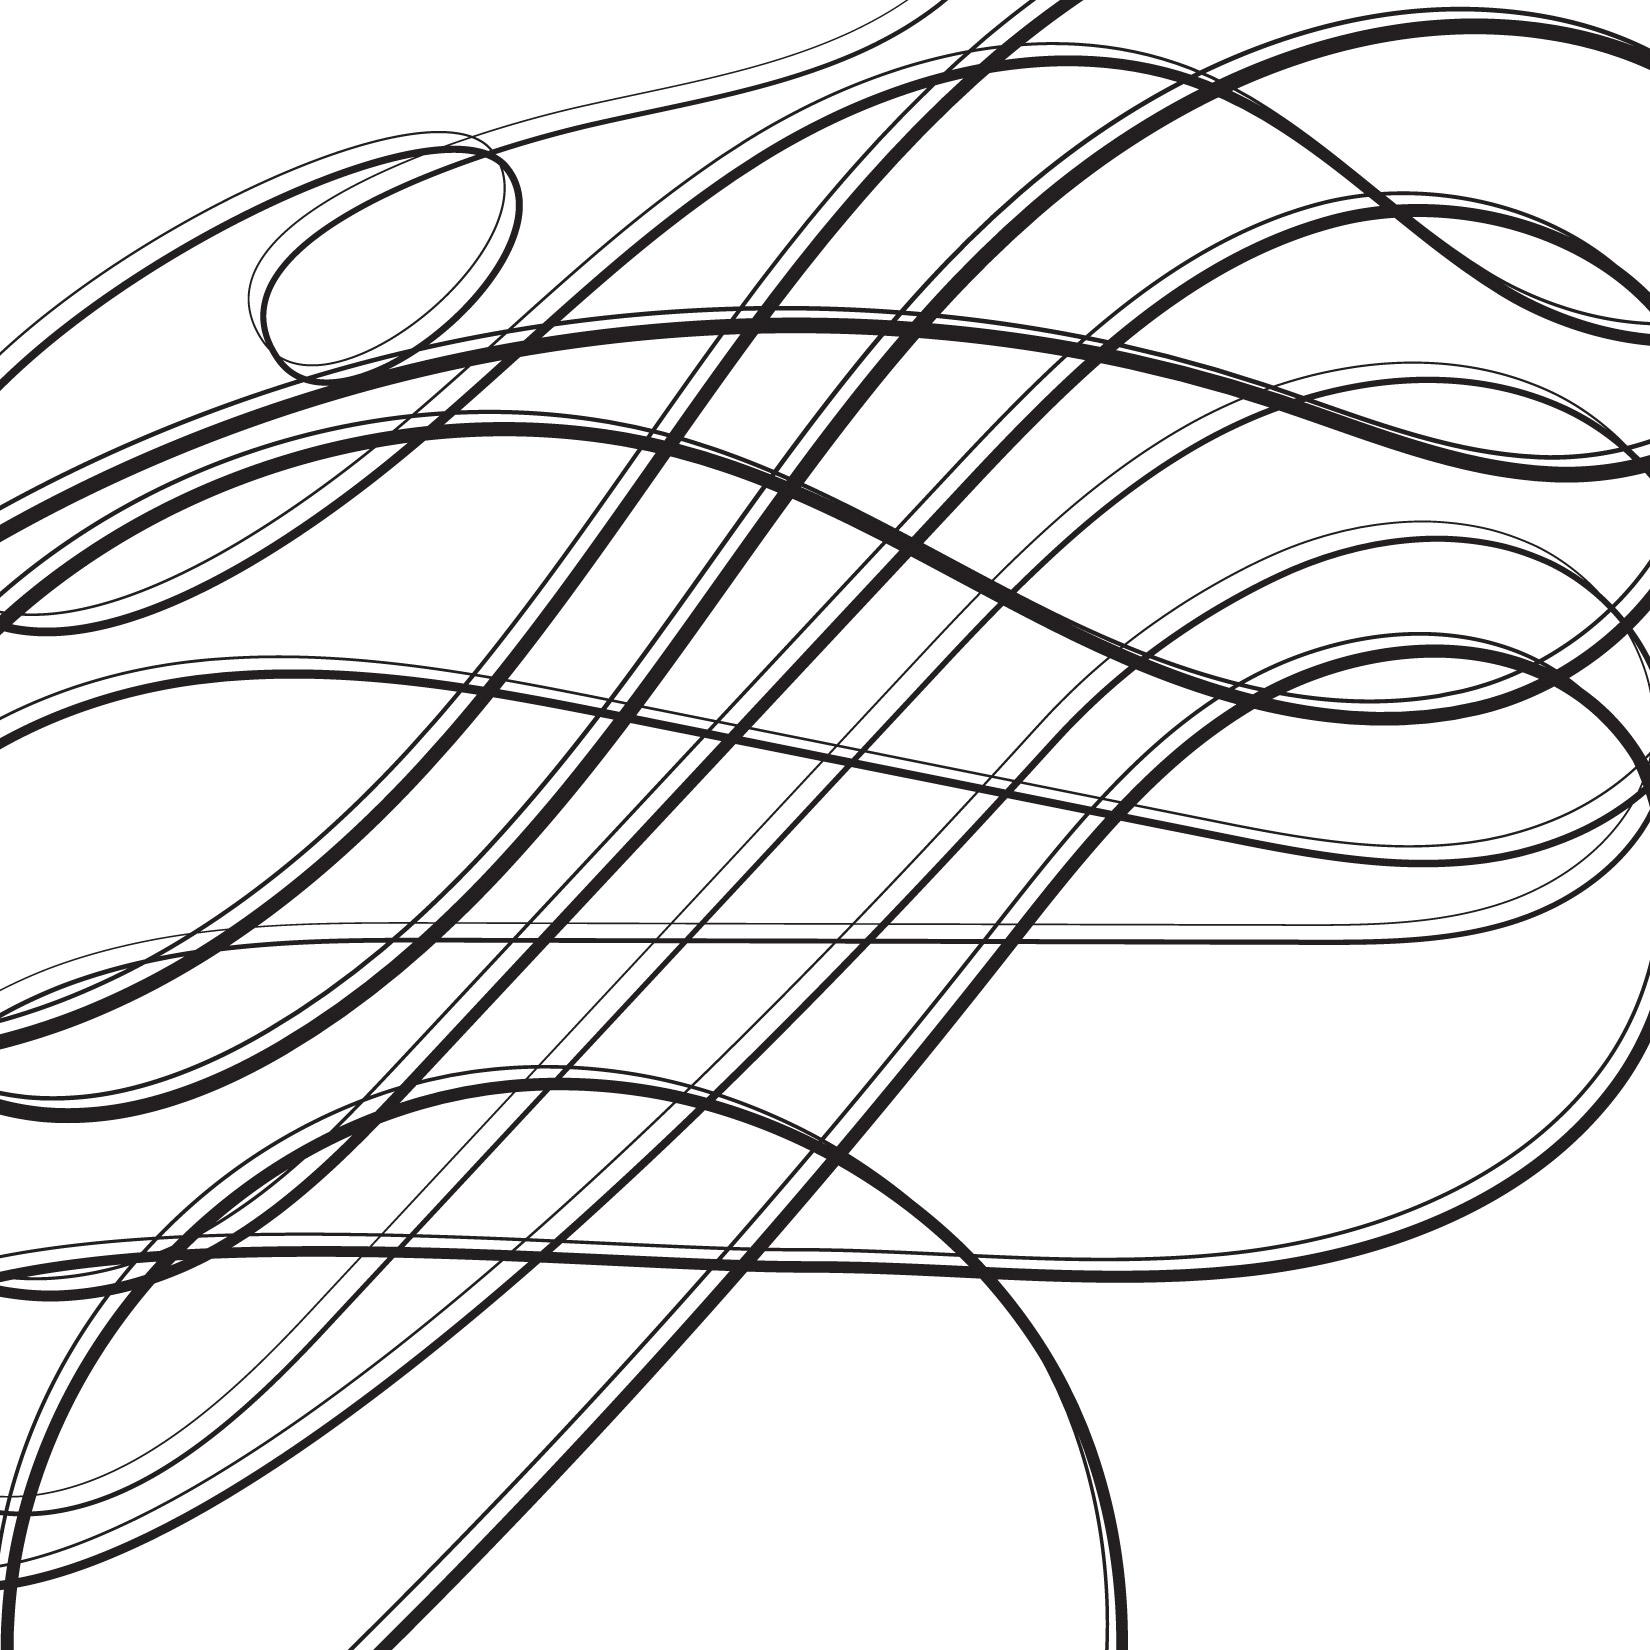 Calligraphic Lines 02